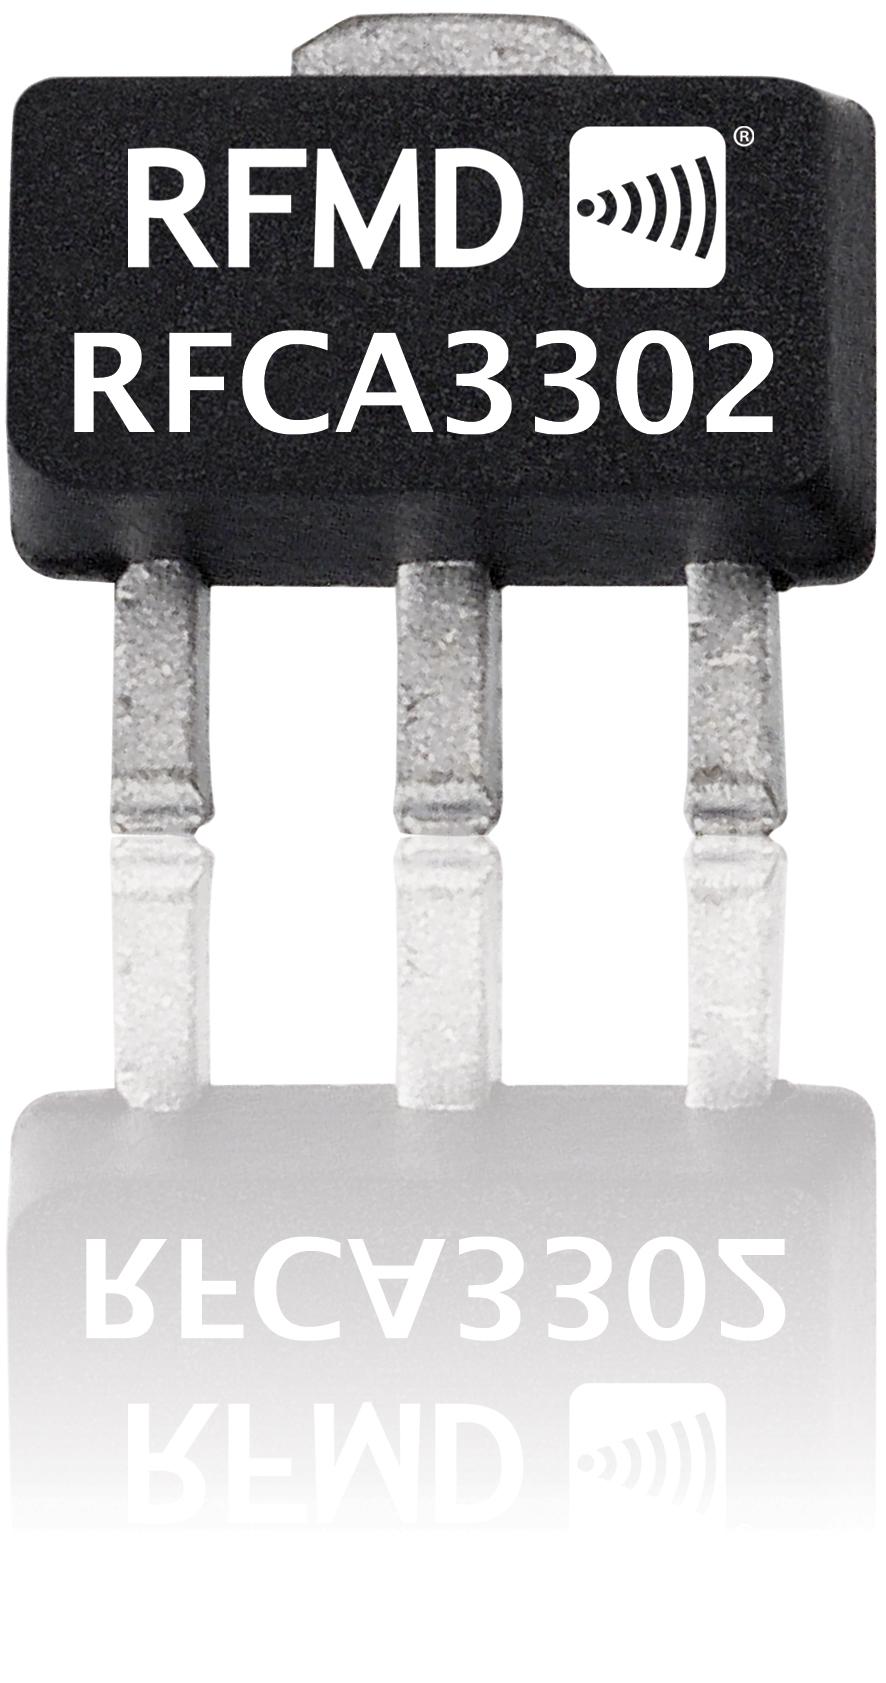 40mhz to 1008mhz gaas amplifier rfca330240mhz To 1008mhz Gaas Amplifier #3